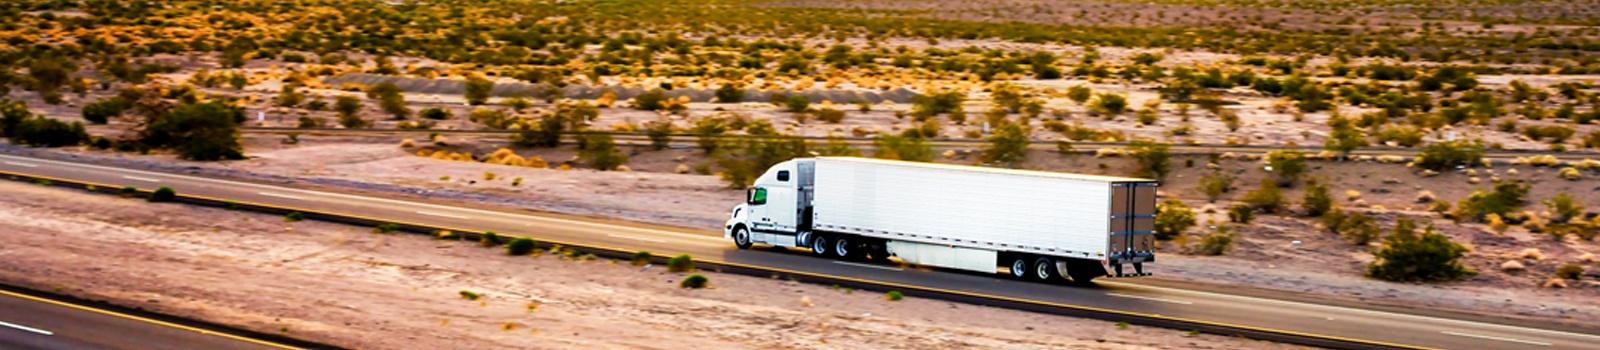 Semi Truck Financing for OTR Trucking Companies